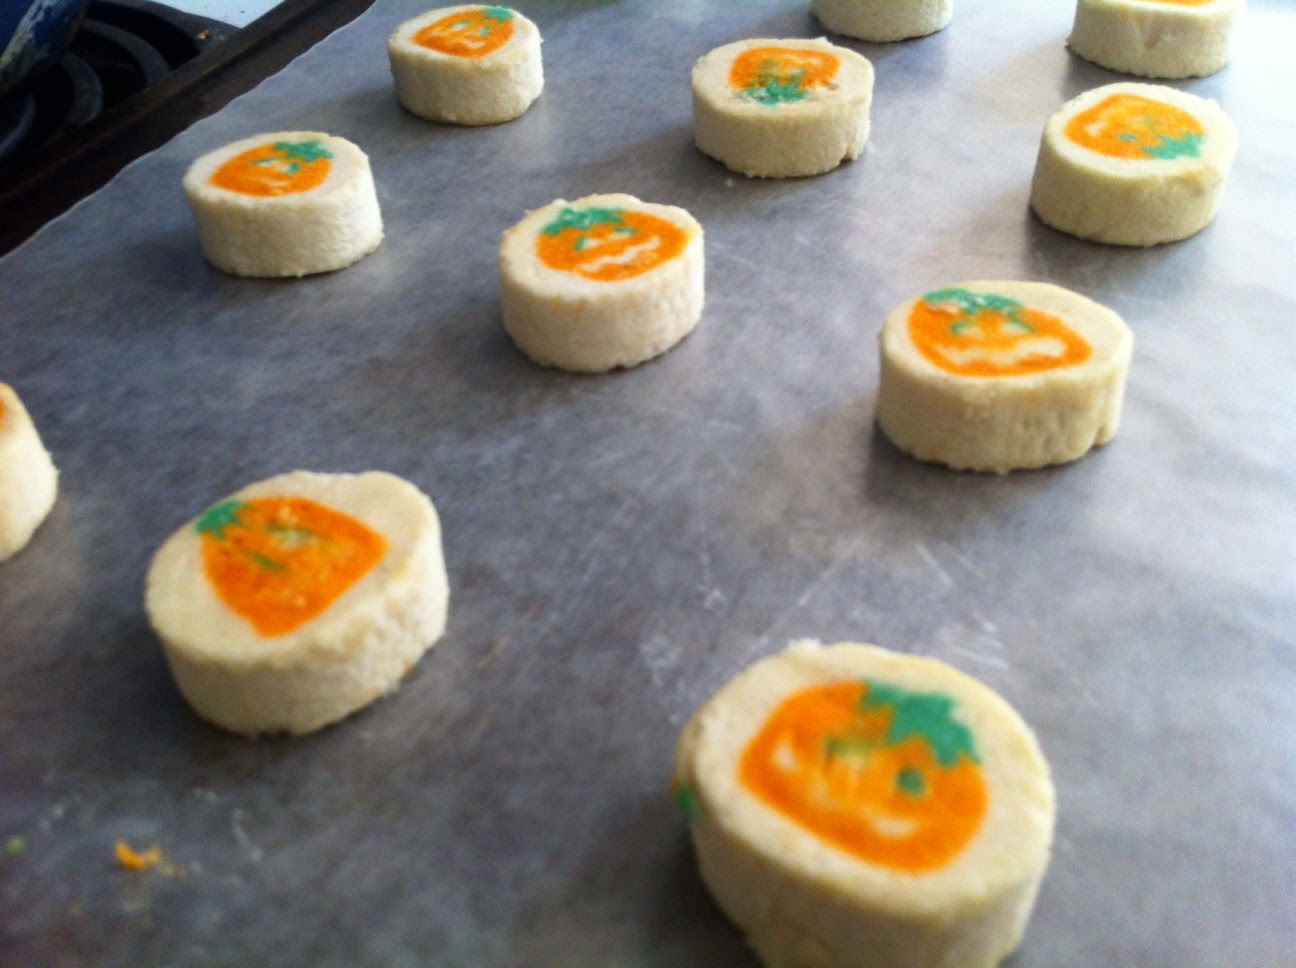 Pillsbury's Pumpkin-Faced Sugar Cookies — Bridey O'Leary